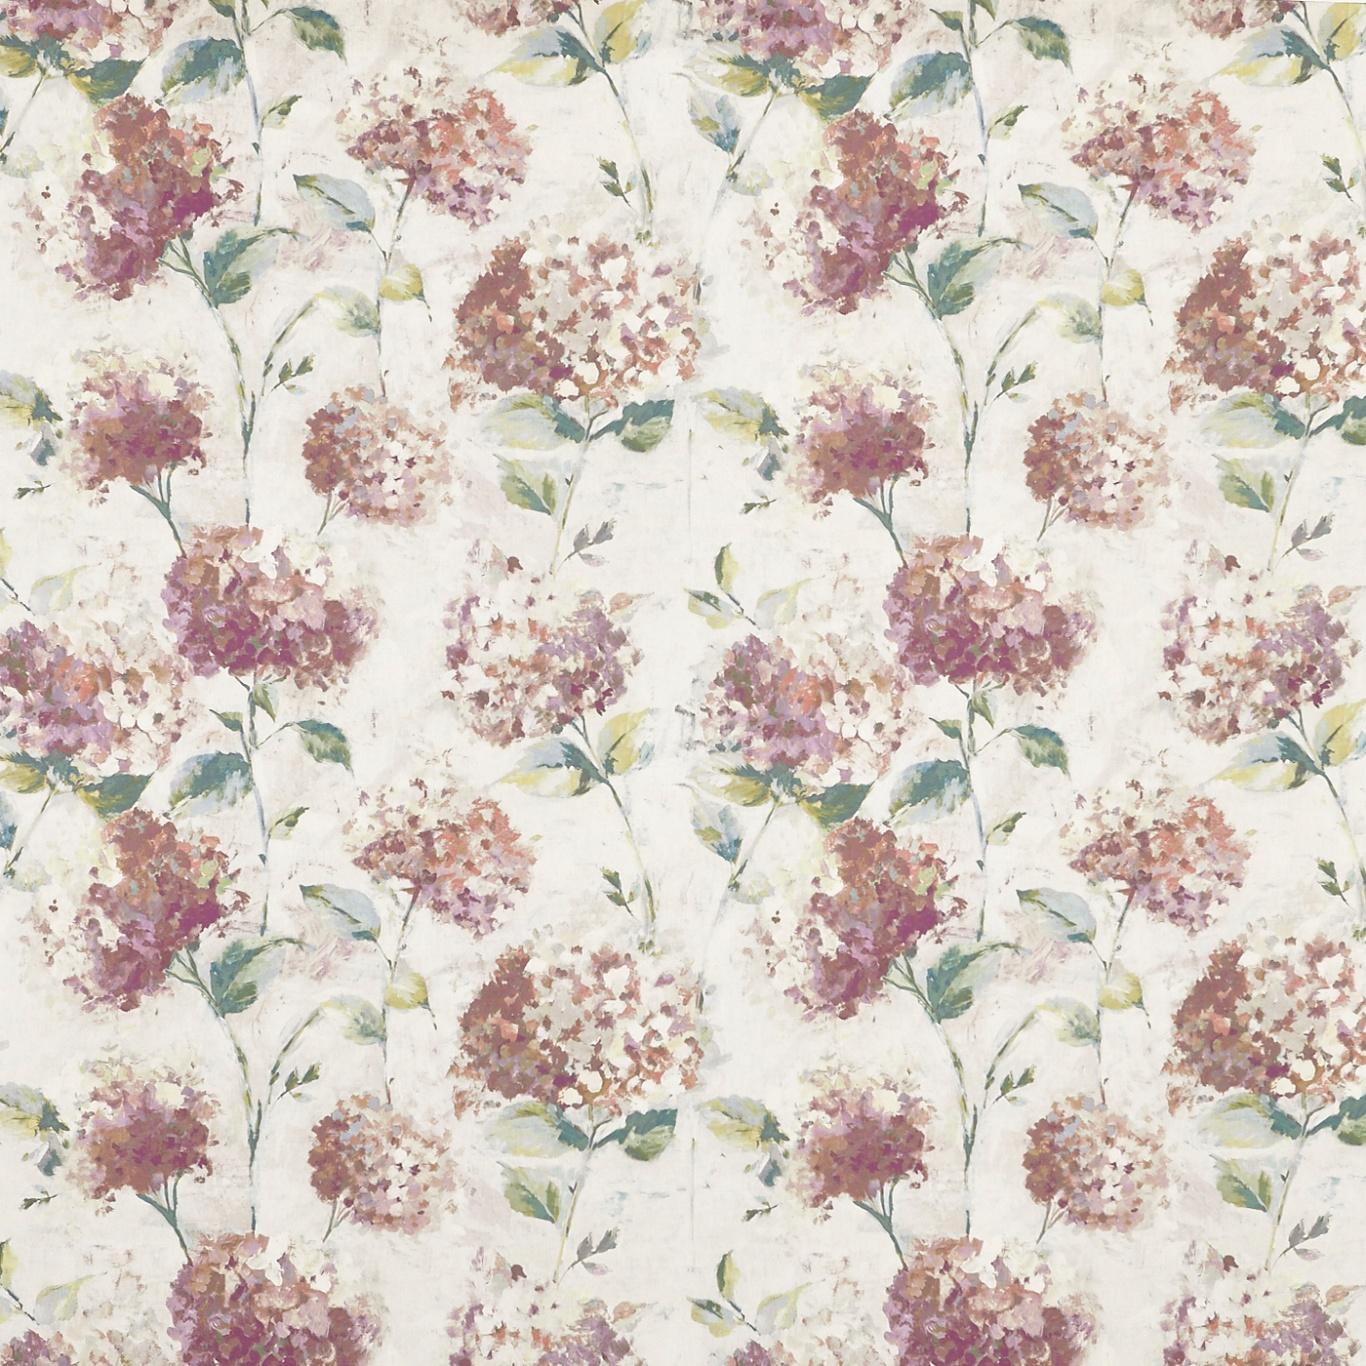 Image of Prestigious Angelica Wild Rose Fabric 8674/254